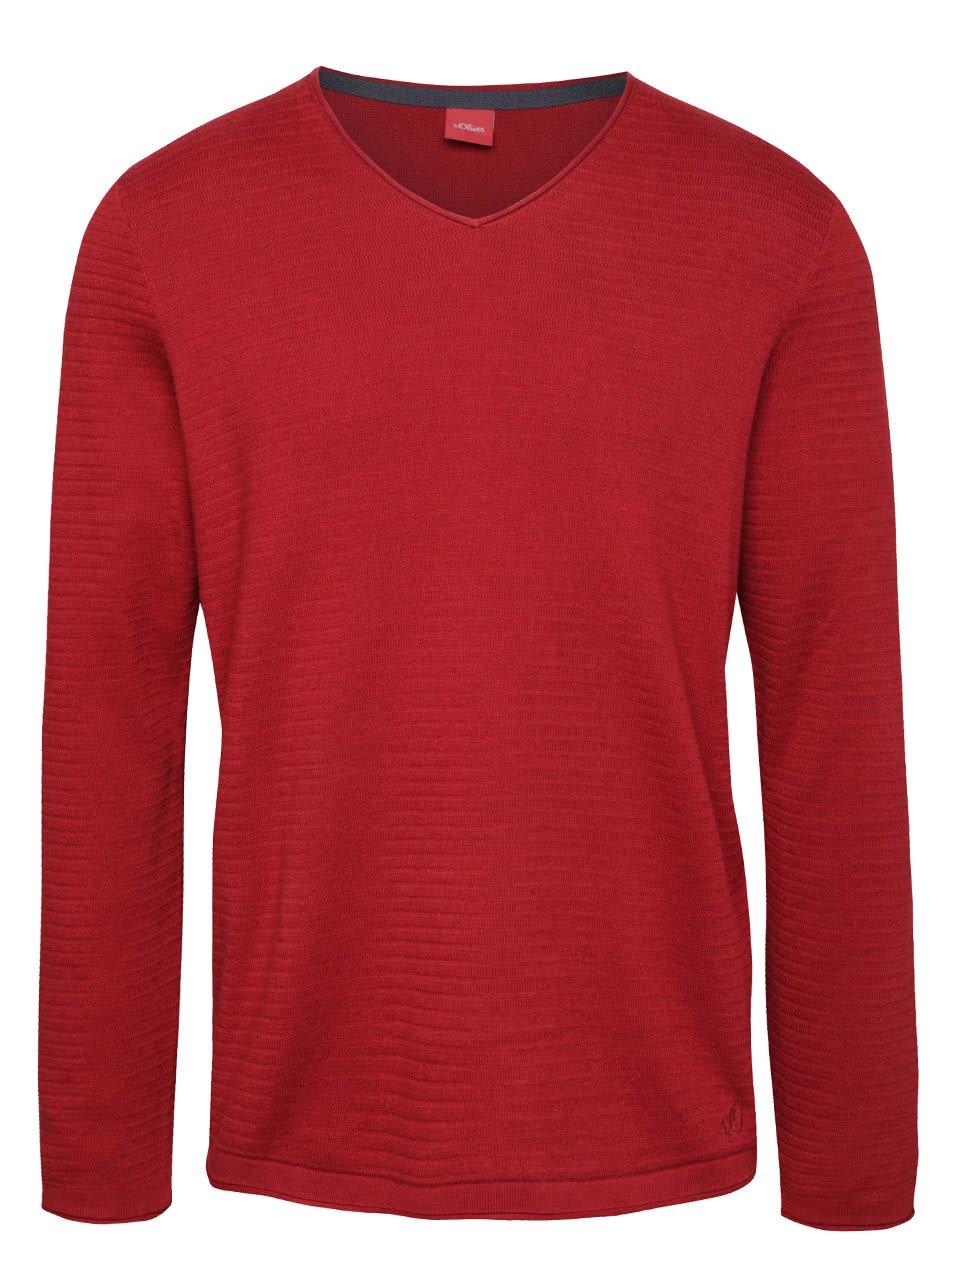 Červený pánský svetr s véčkovým výstřihem s.Oliver